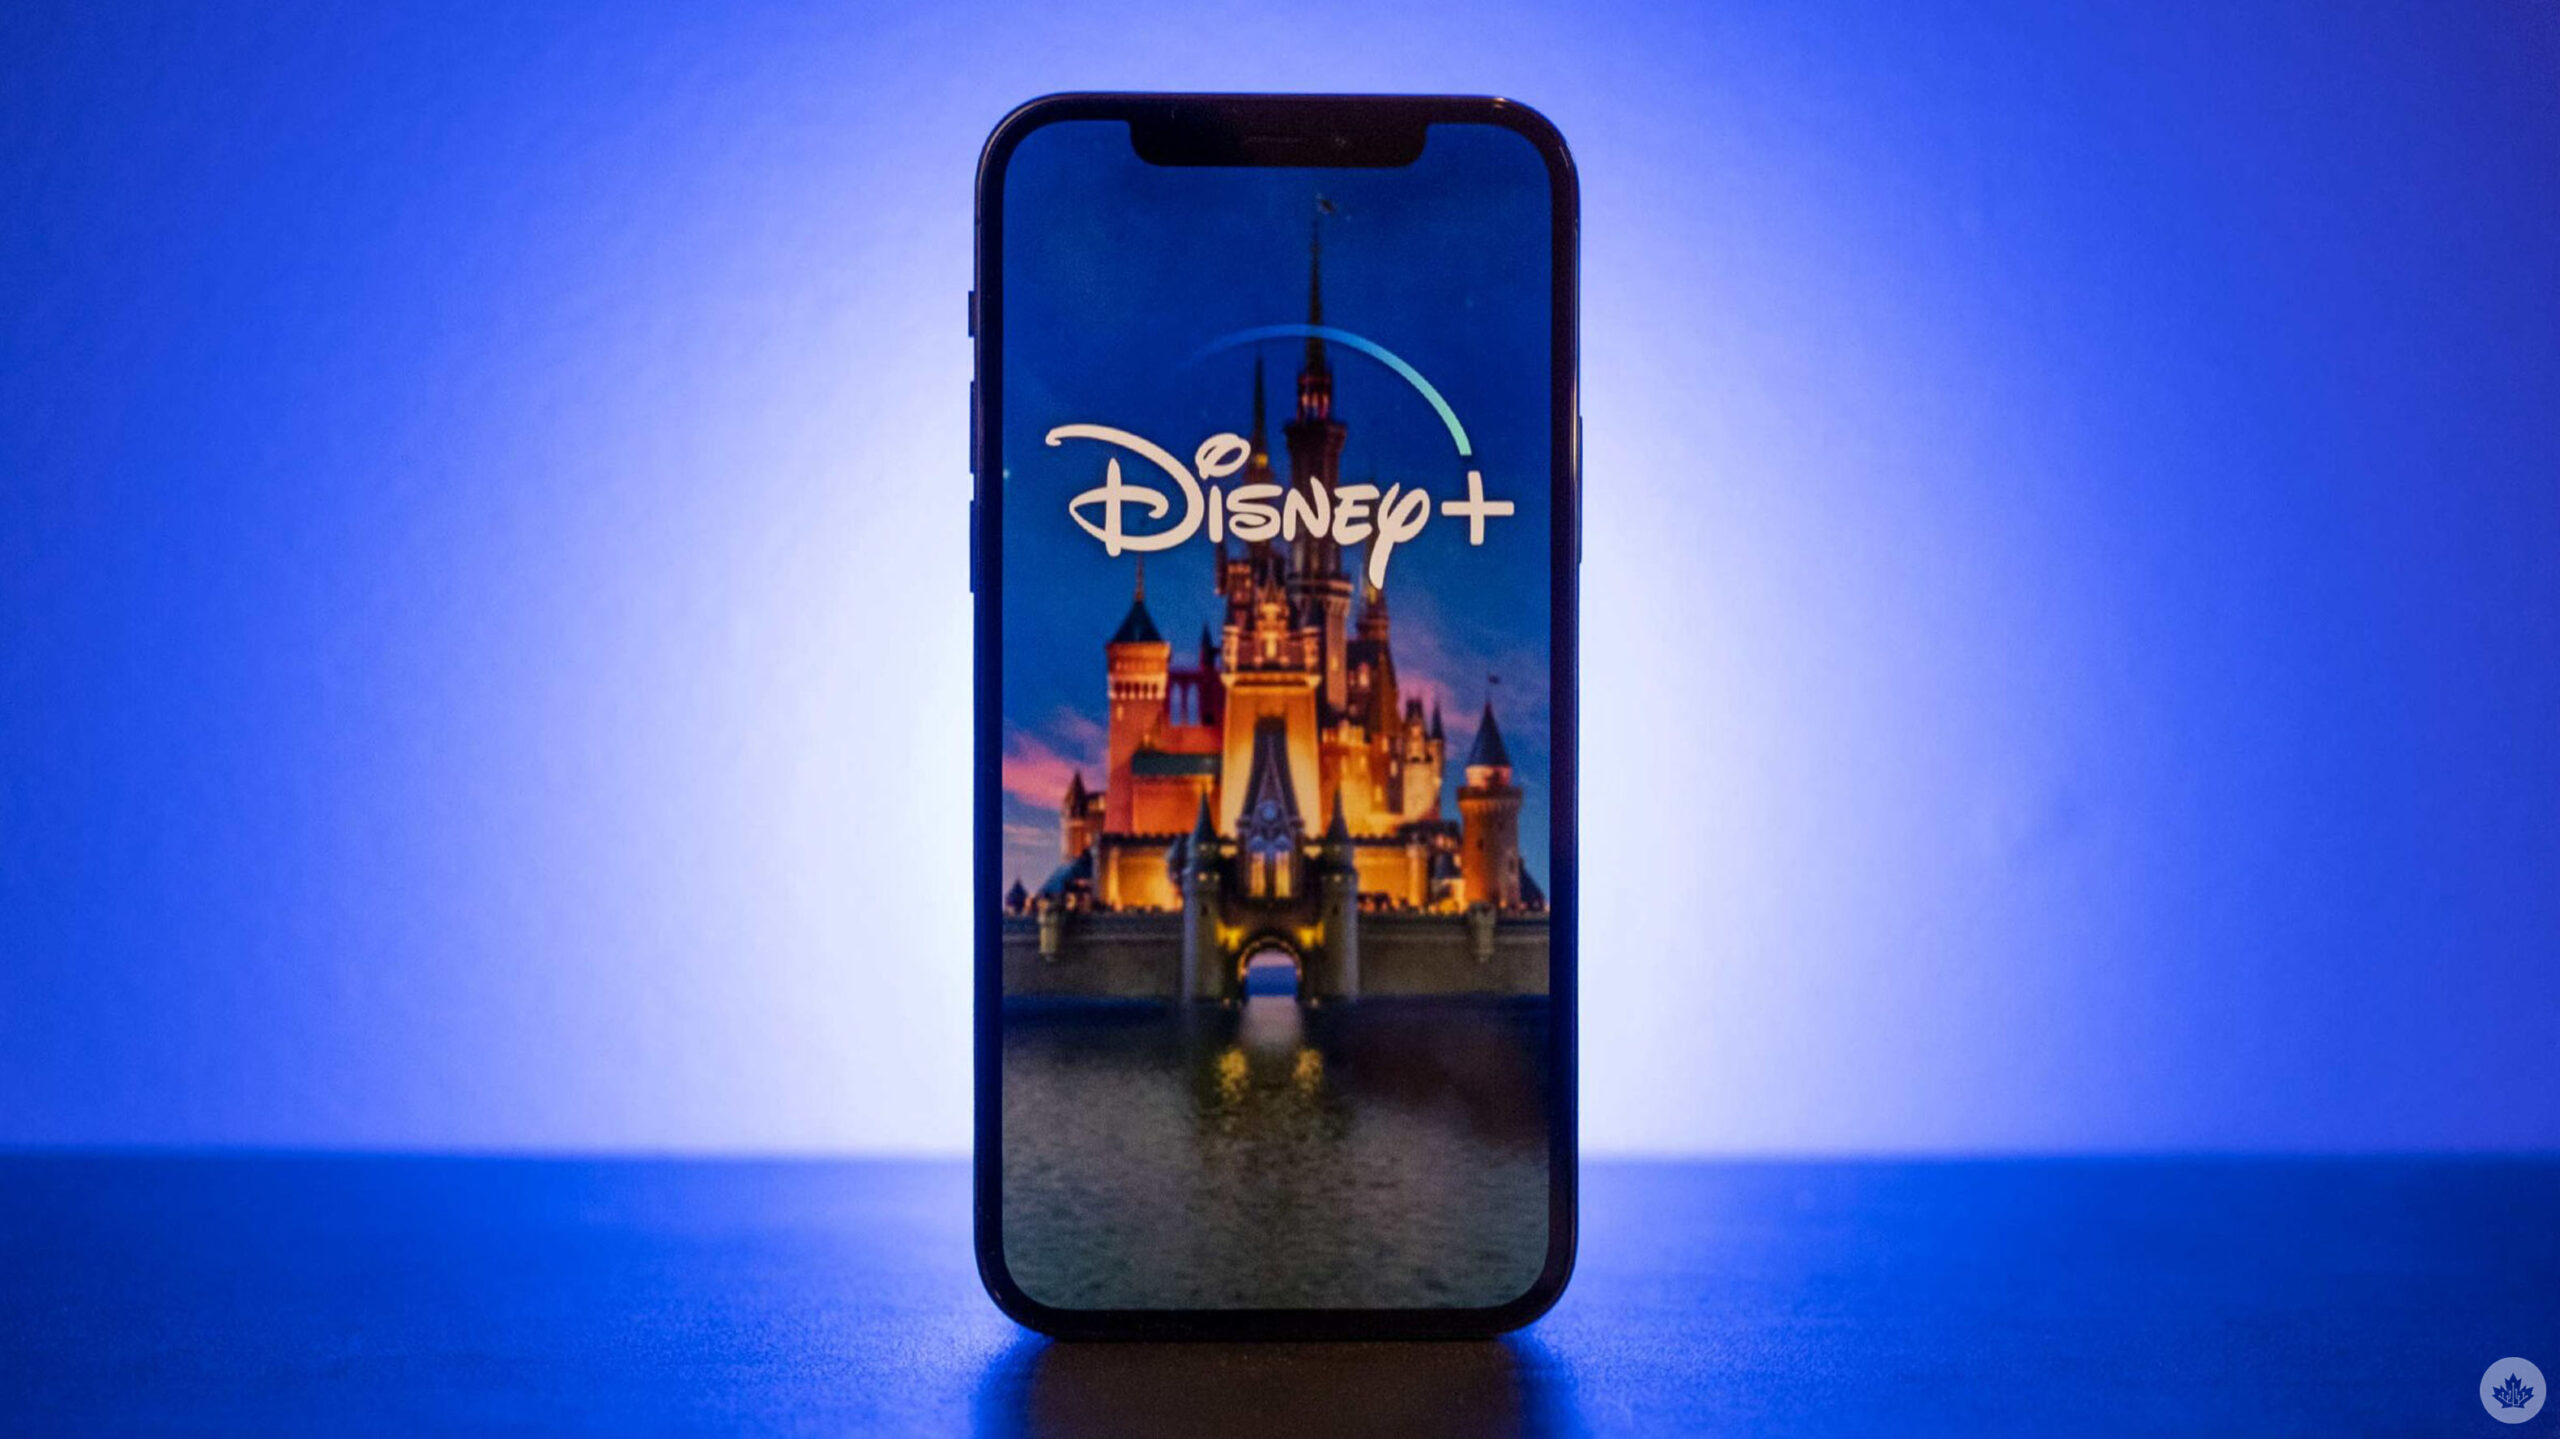 Disney+ on an iPhone